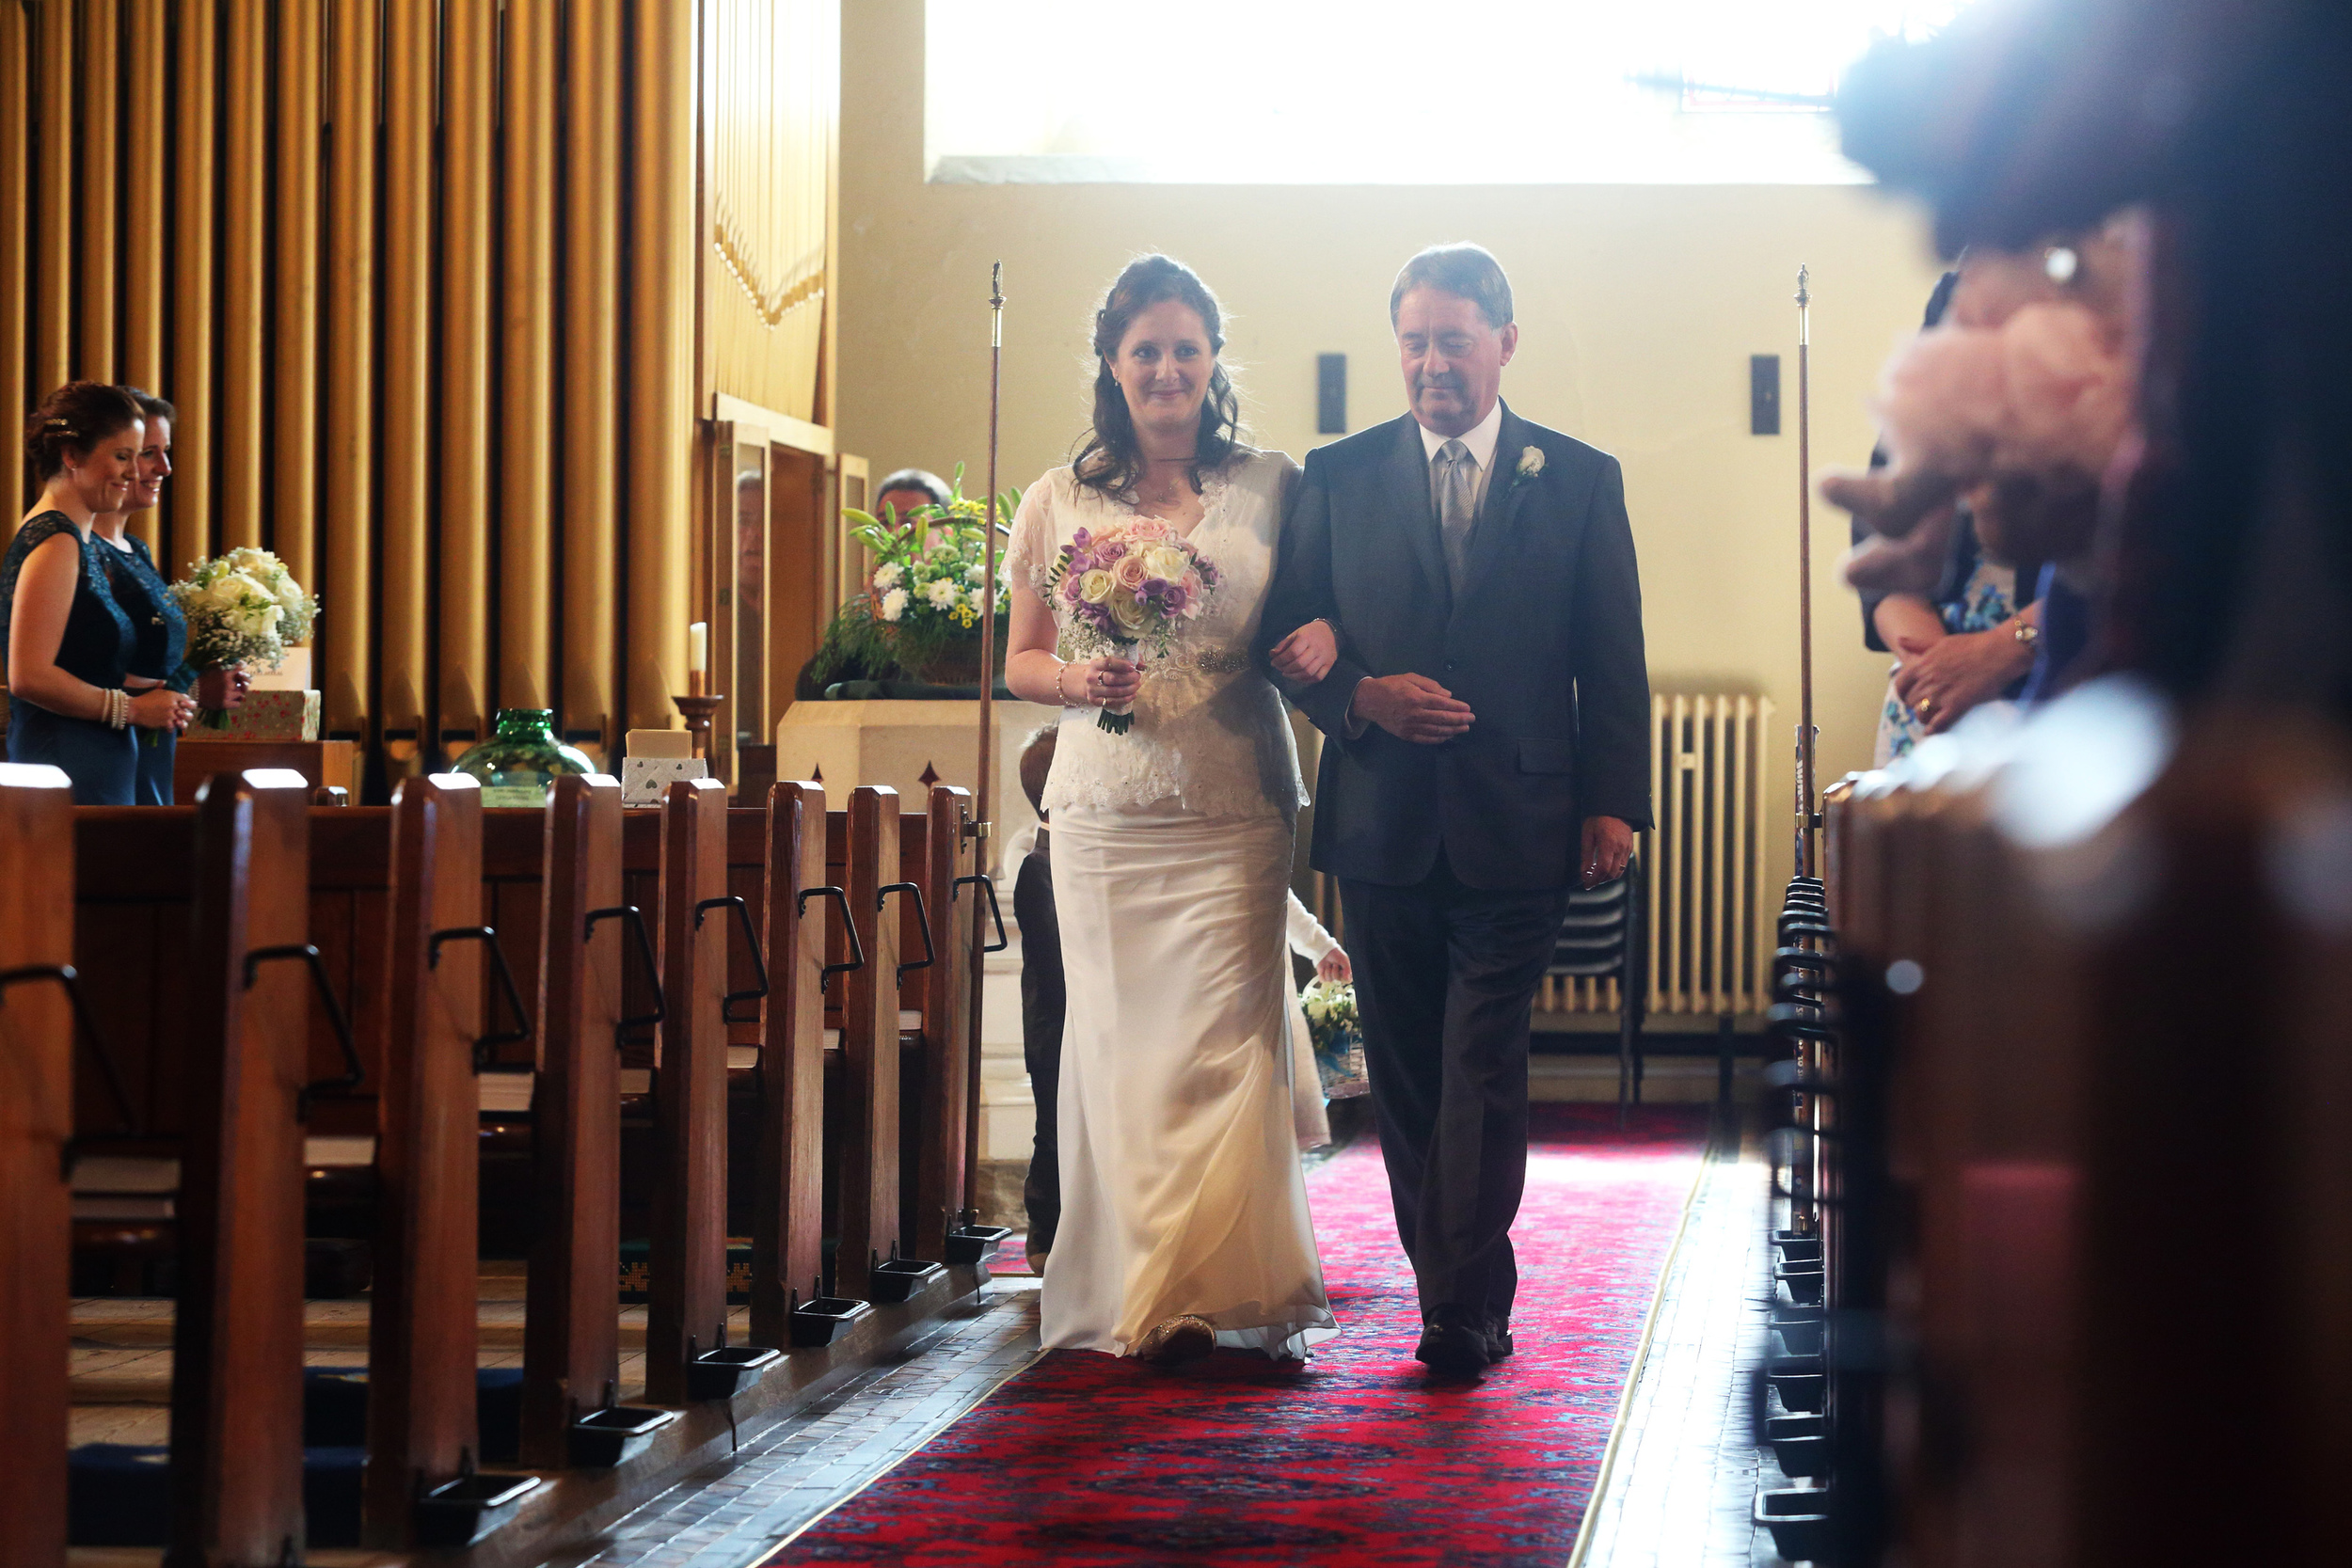 Ocean-View-Gower-Wedding-Photographer-016.JPG